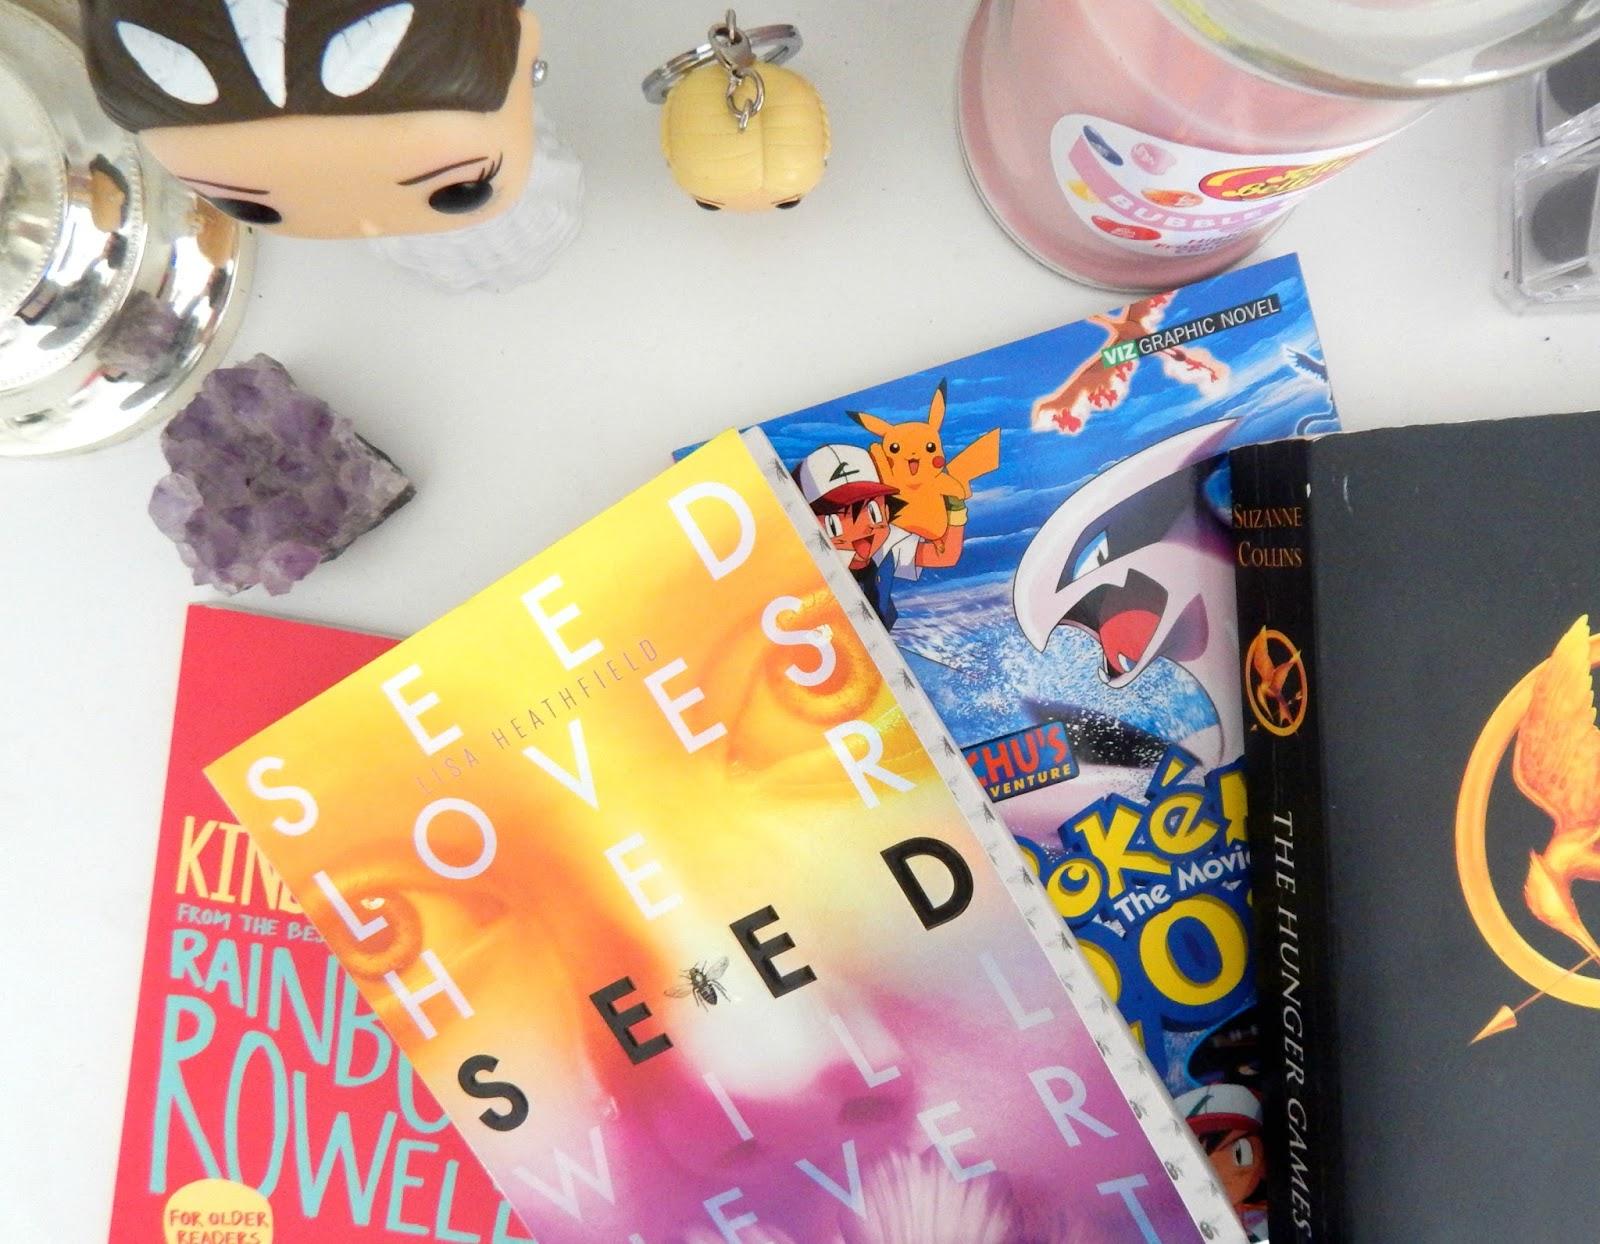 Several books on a desk